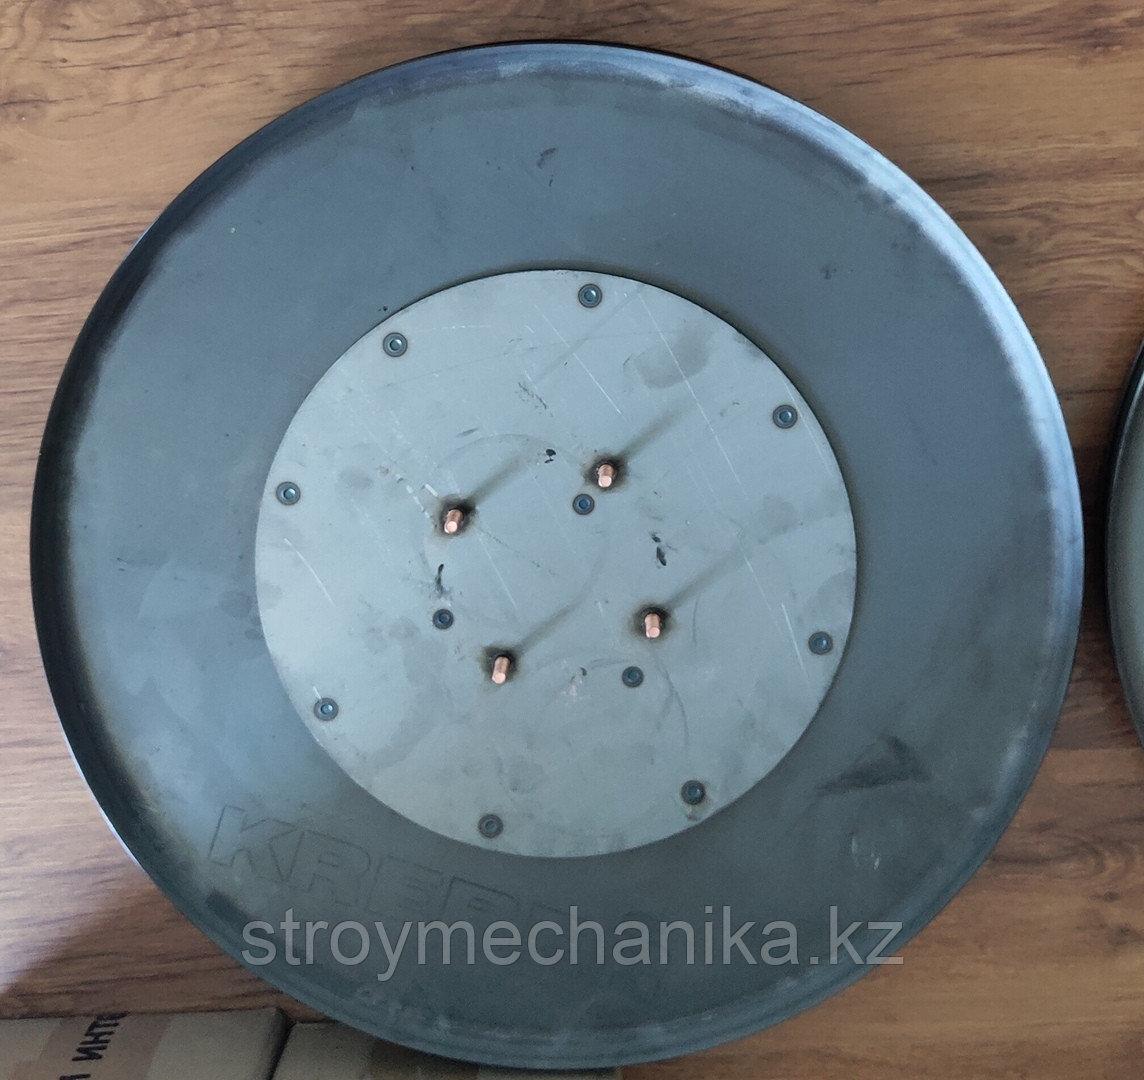 Затирочный диск 60см. Кreber K-600ЕТР